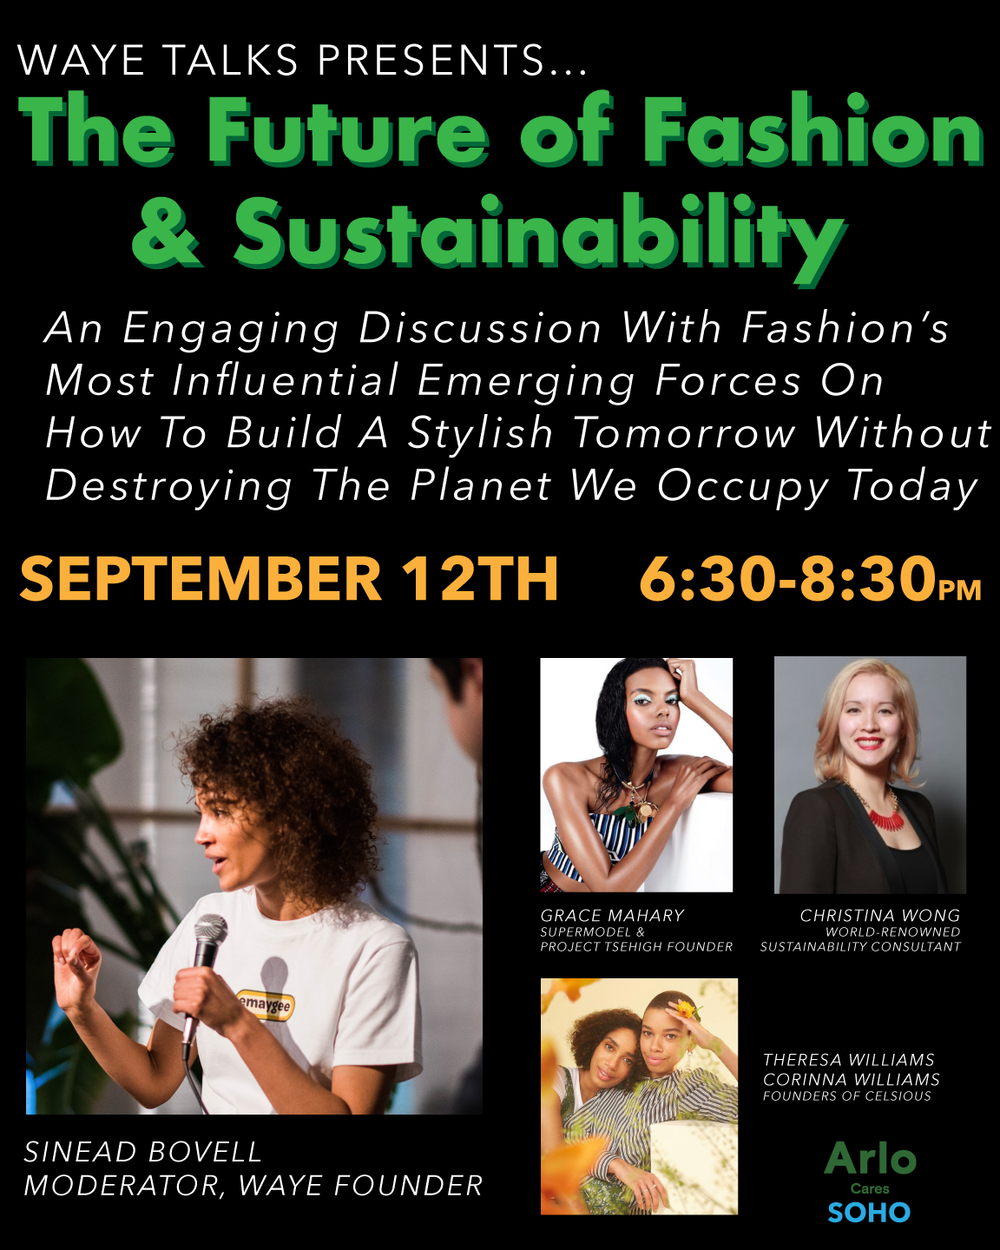 WAYE Talks - The Future of Fashion & Sustainability